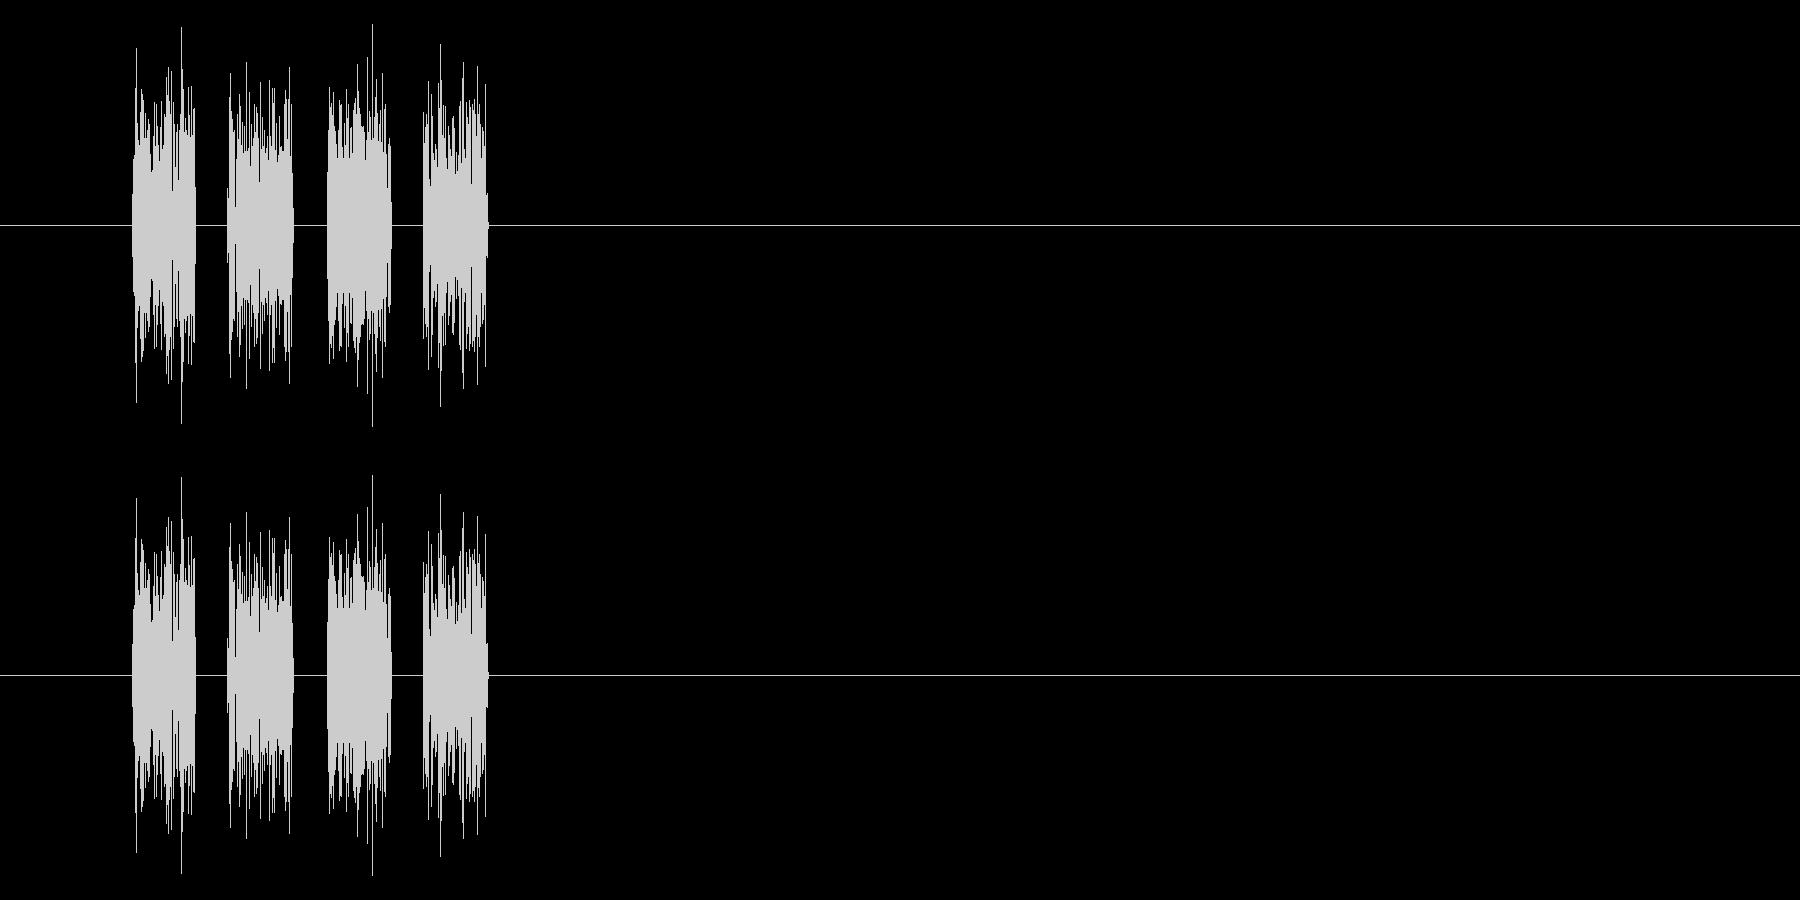 【NES RPG03-12(逃げる)】の未再生の波形